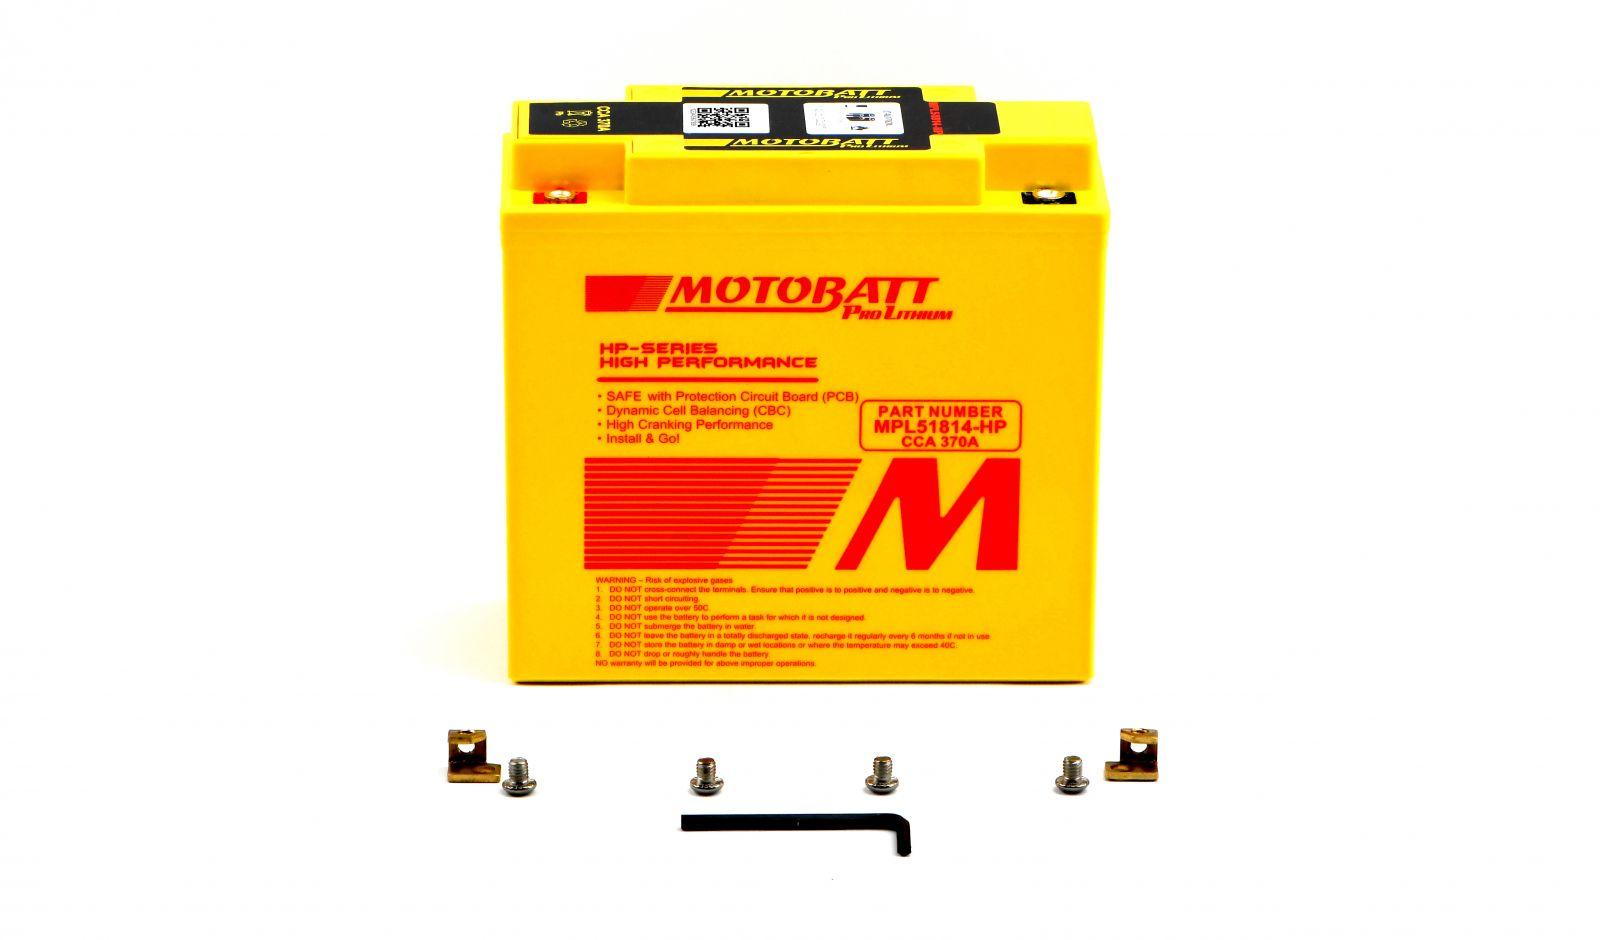 Motobatt Lithium Batteries - 501186MR image